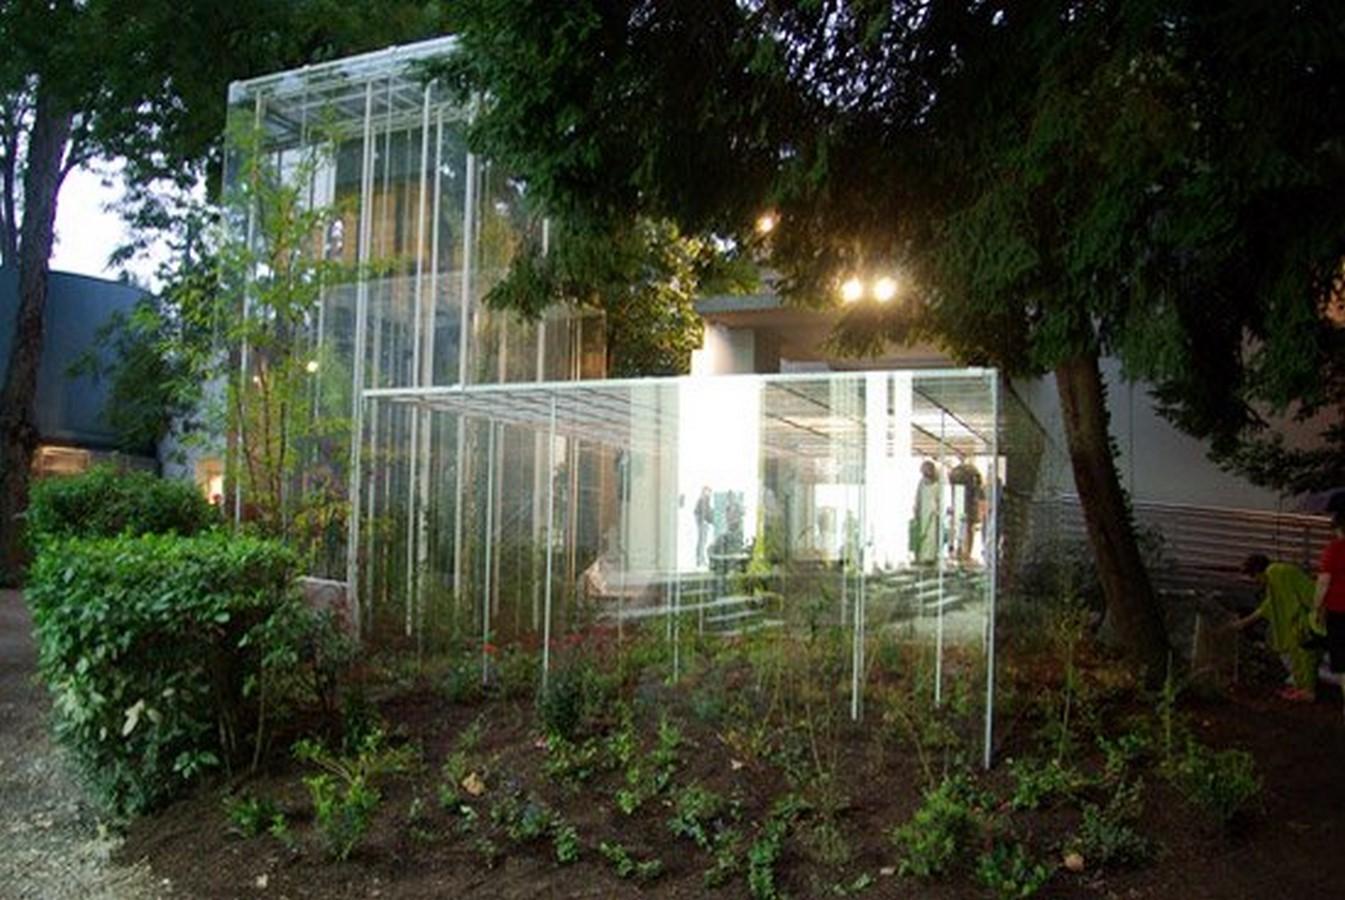 Japanese Pavilion at the Venice Biennale by Junya Ishigami - Sheet1